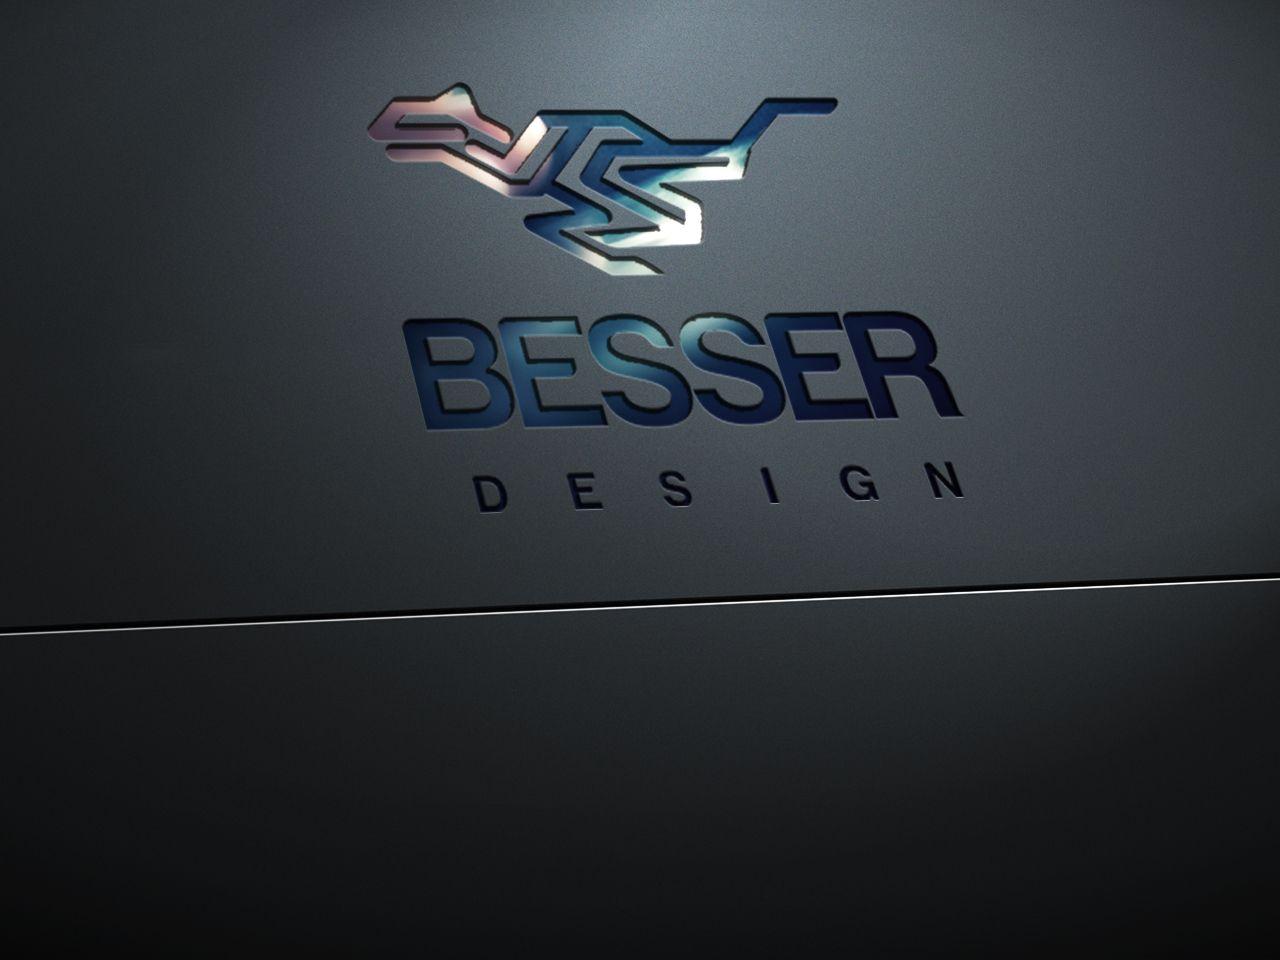 Логотип для тюнинг-ателье BESSER - дизайнер GoldenHorse